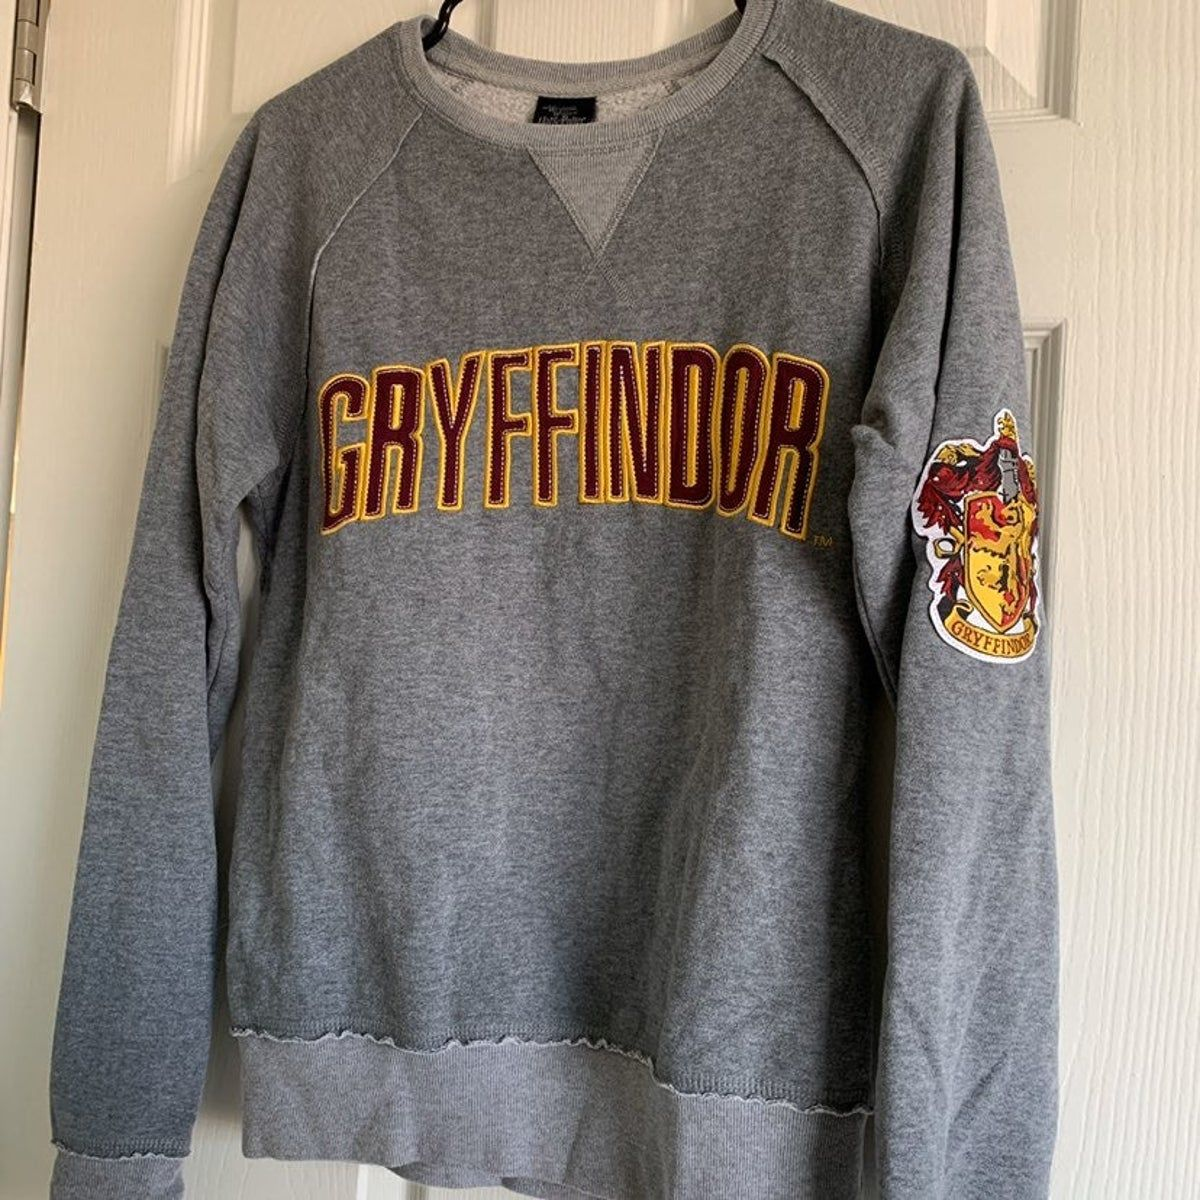 Harry Potter Gryffindor Sweater Harry Potter Outfits Harry Potter Sweater Hogwarts Outfits [ 1200 x 1200 Pixel ]